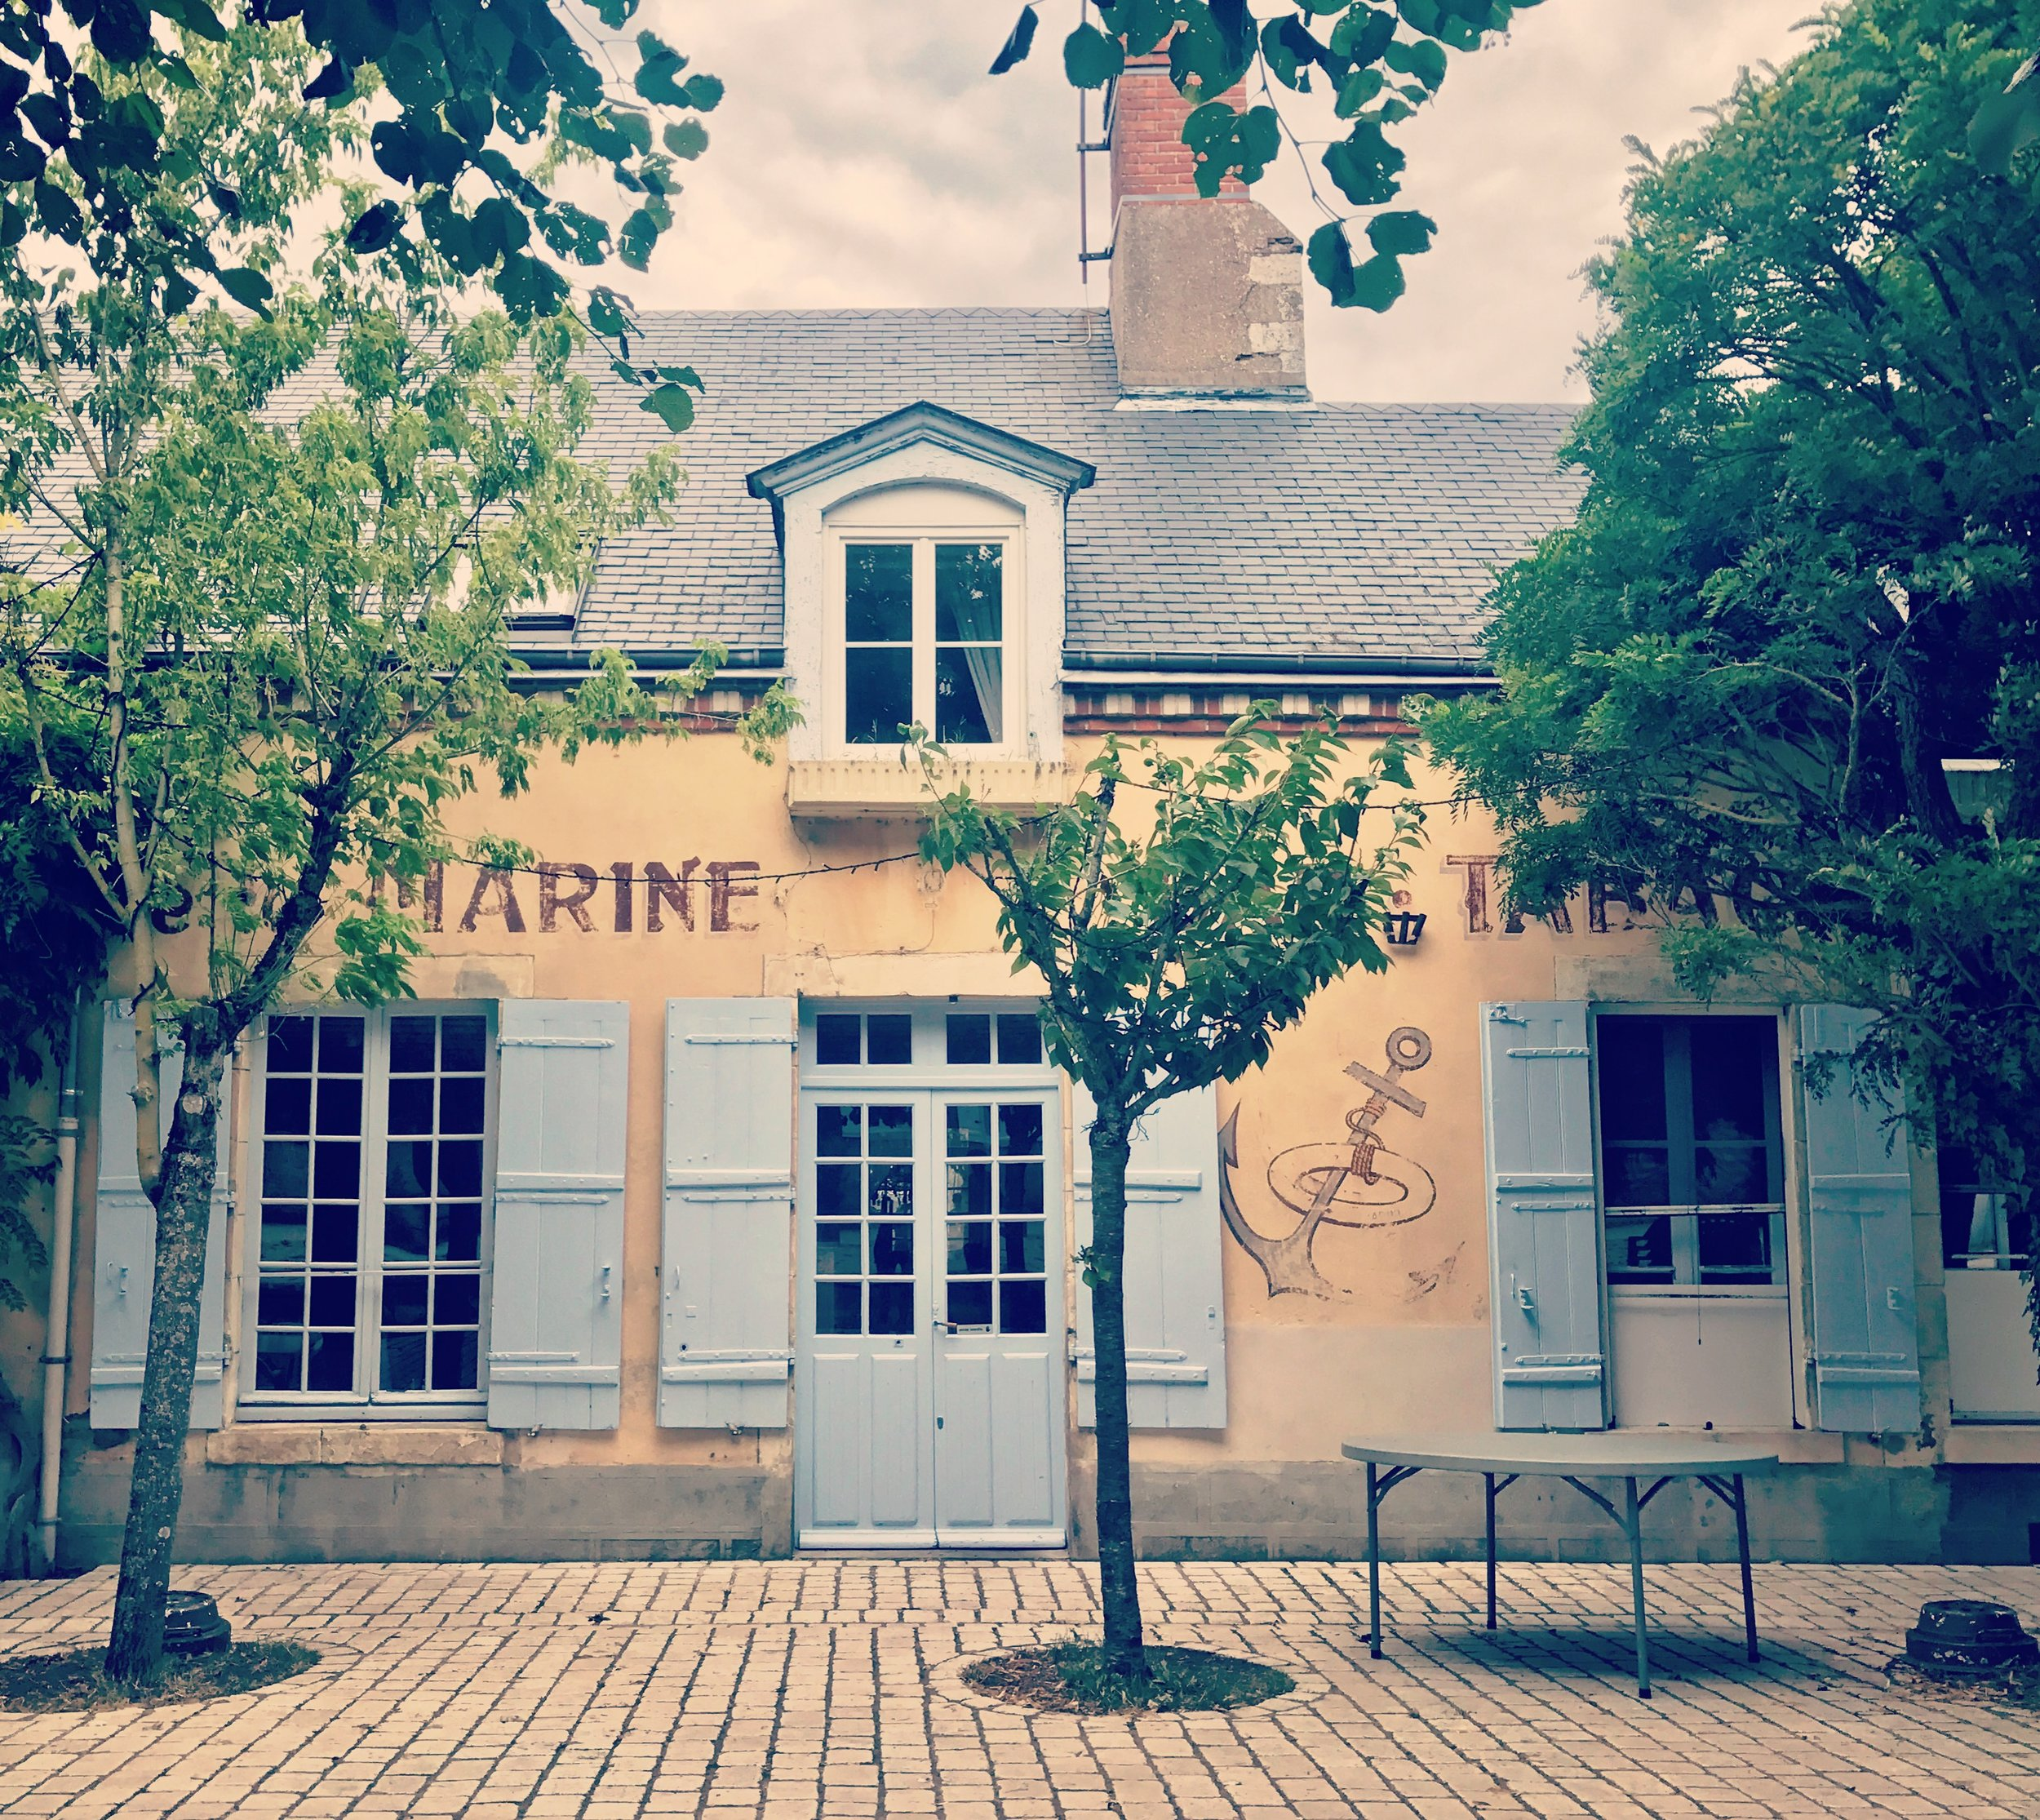 1. La Marine Restaurant and Apartments -